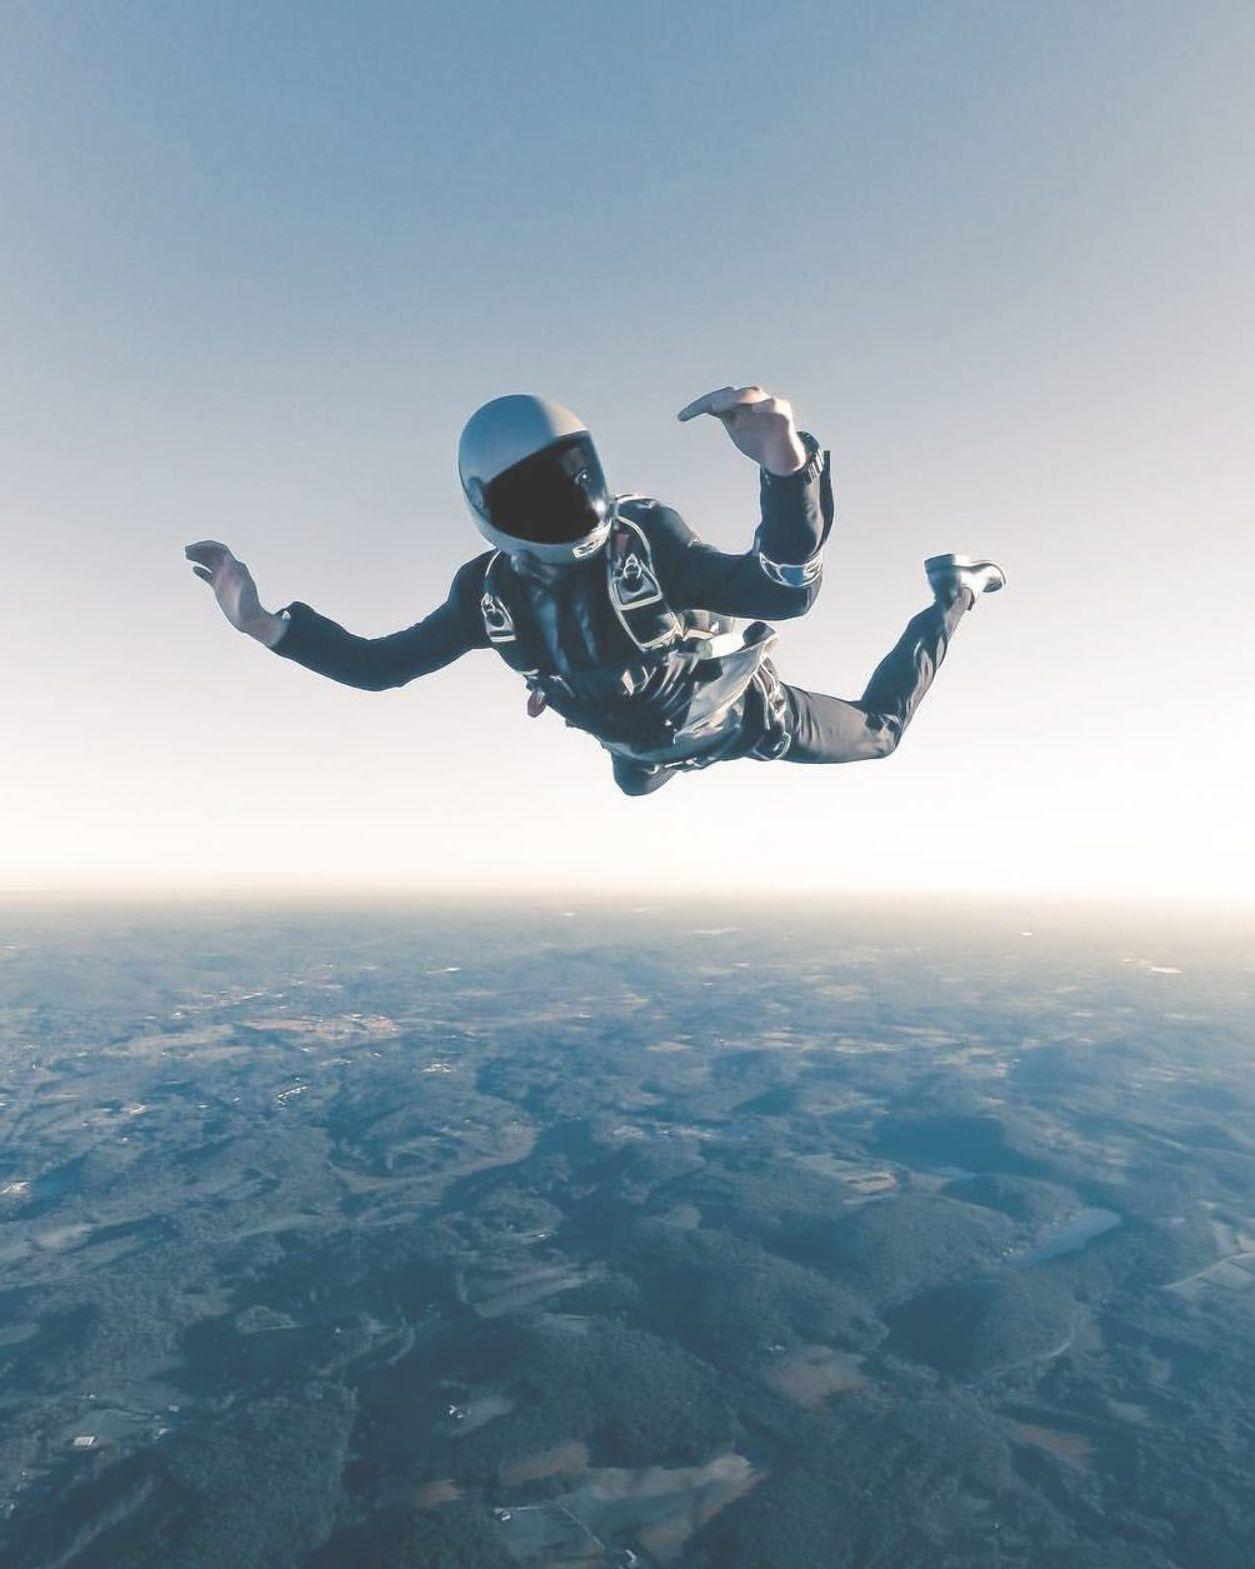 Flying Is Easy When Done By Joel Martinez Photo Itsjoelmartinez